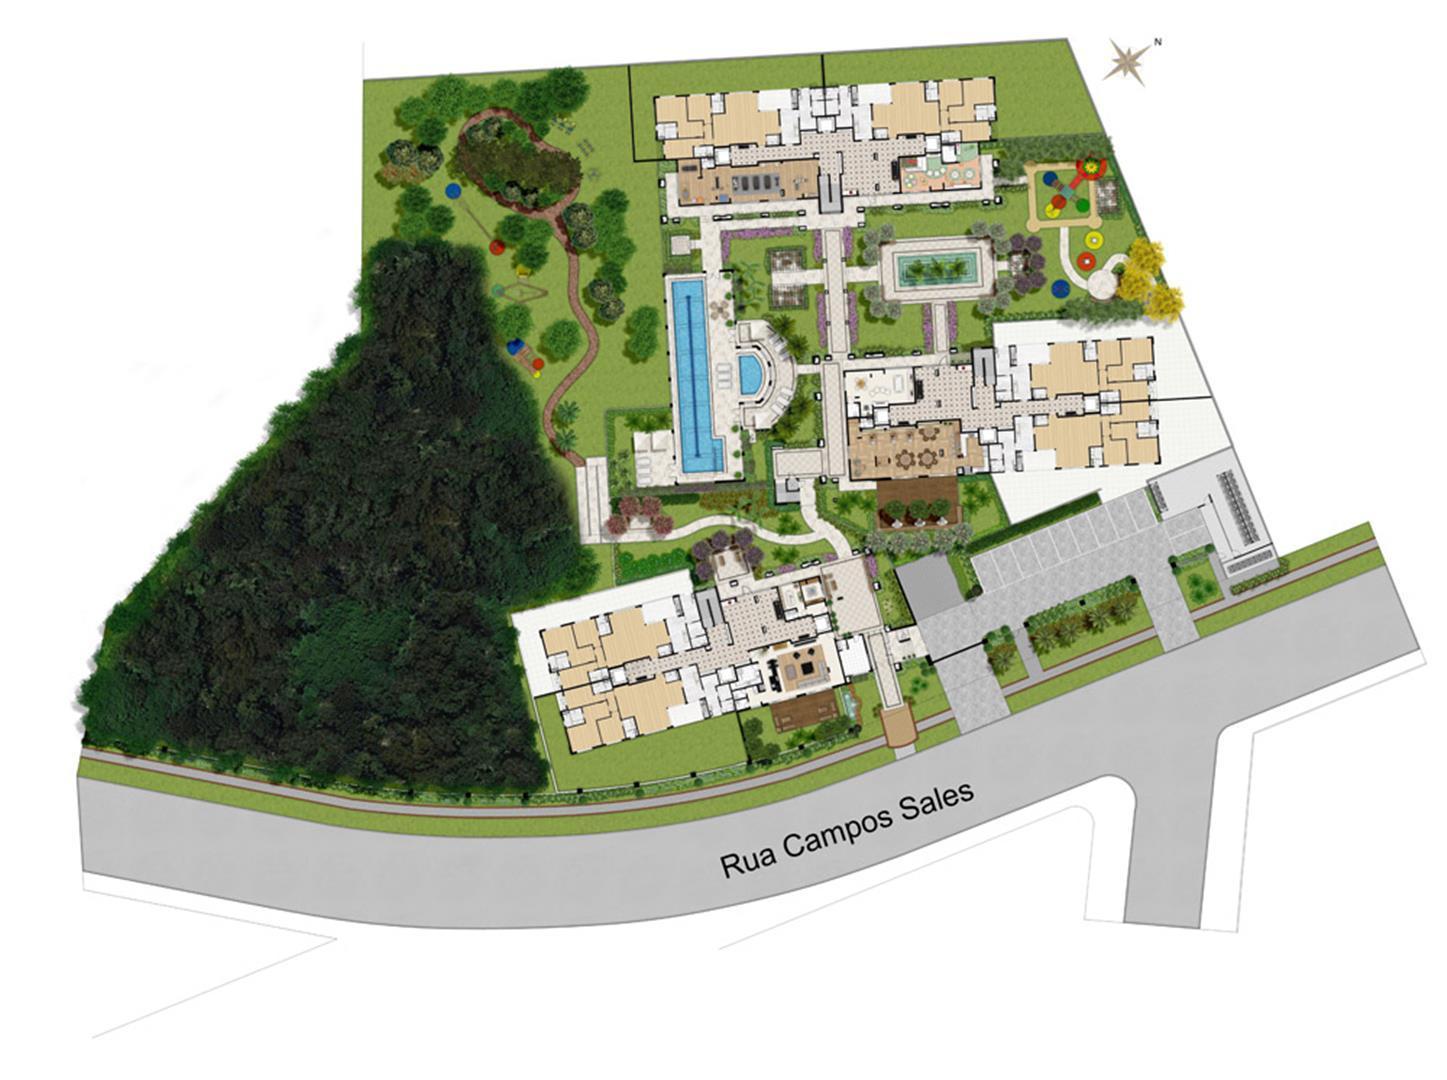 arquitetura mercado imobiliario planta